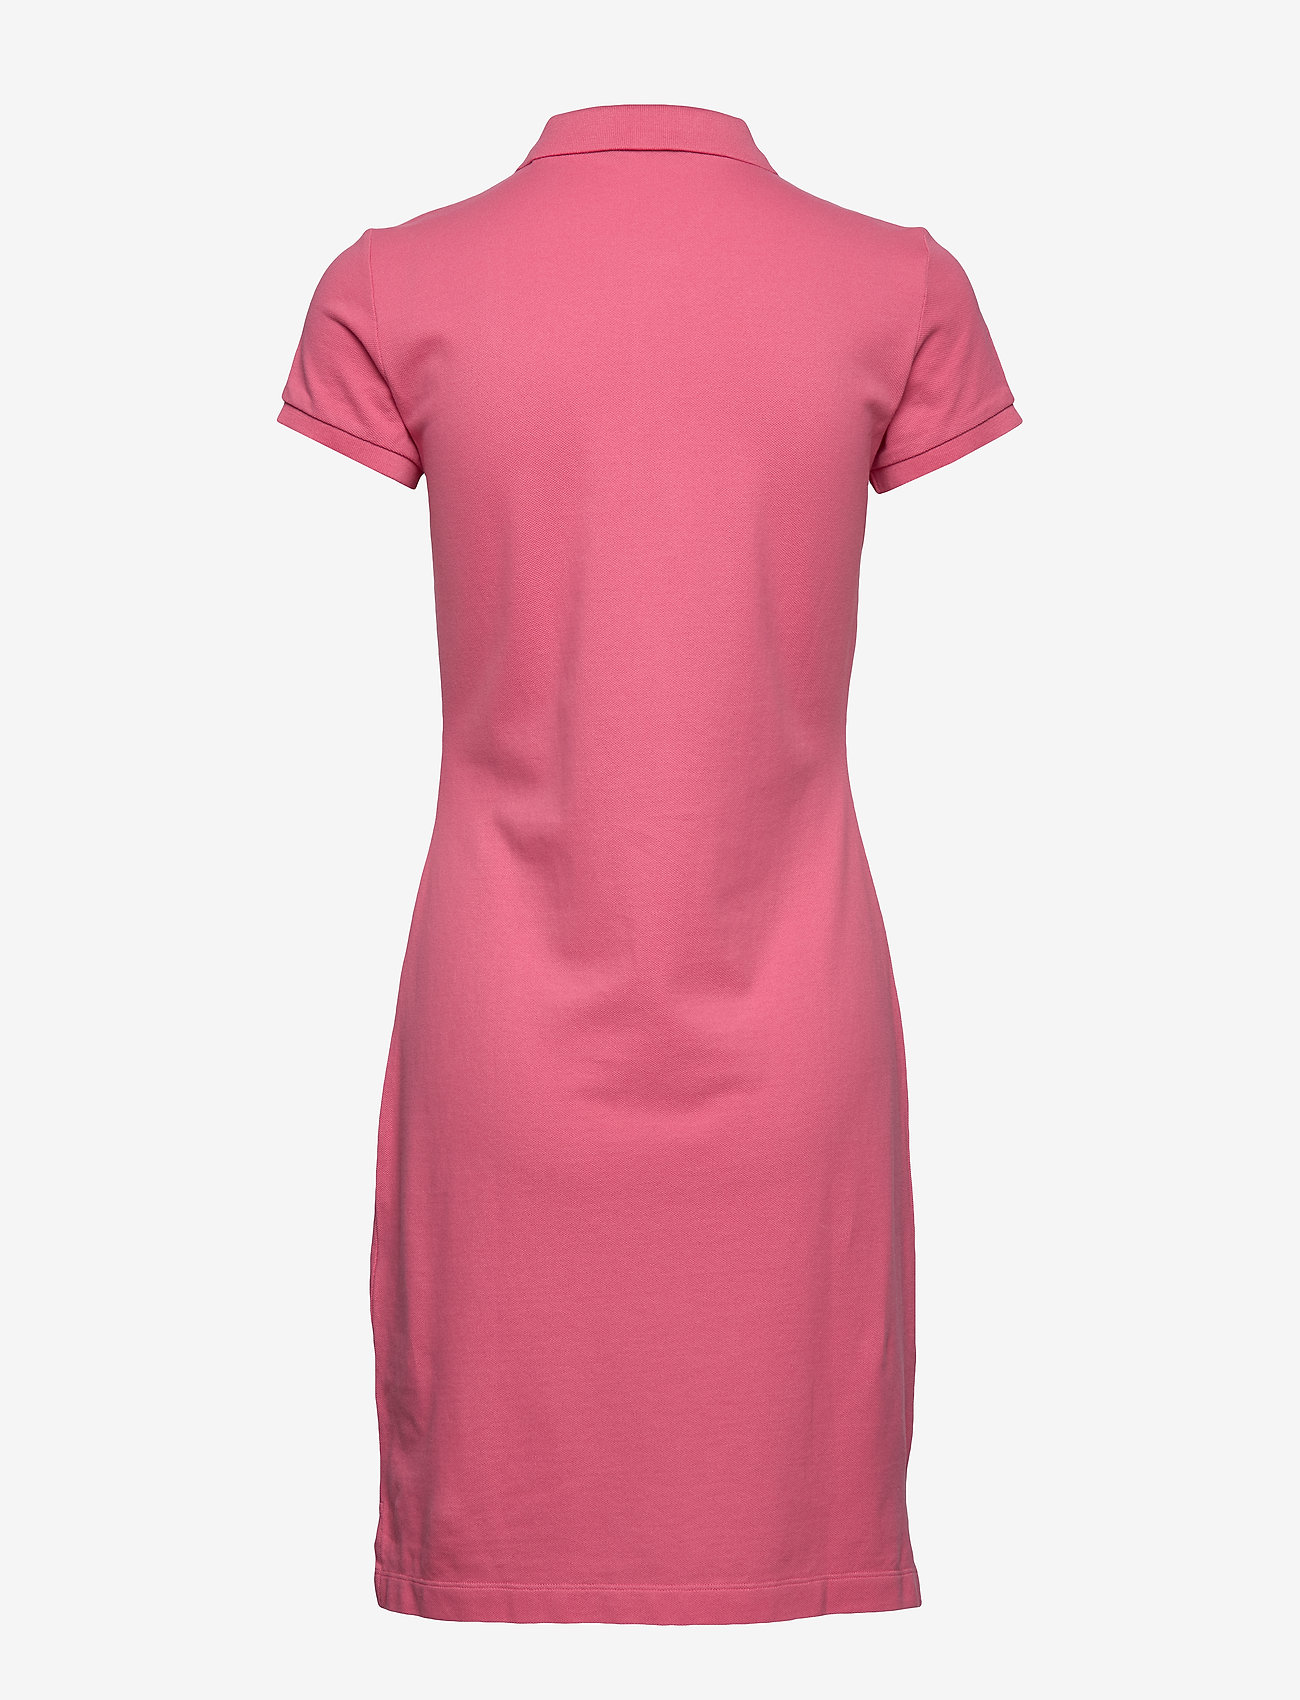 Gant - THE ORIGINAL PIQUE SS DRESS - korta klänningar - rapture rose